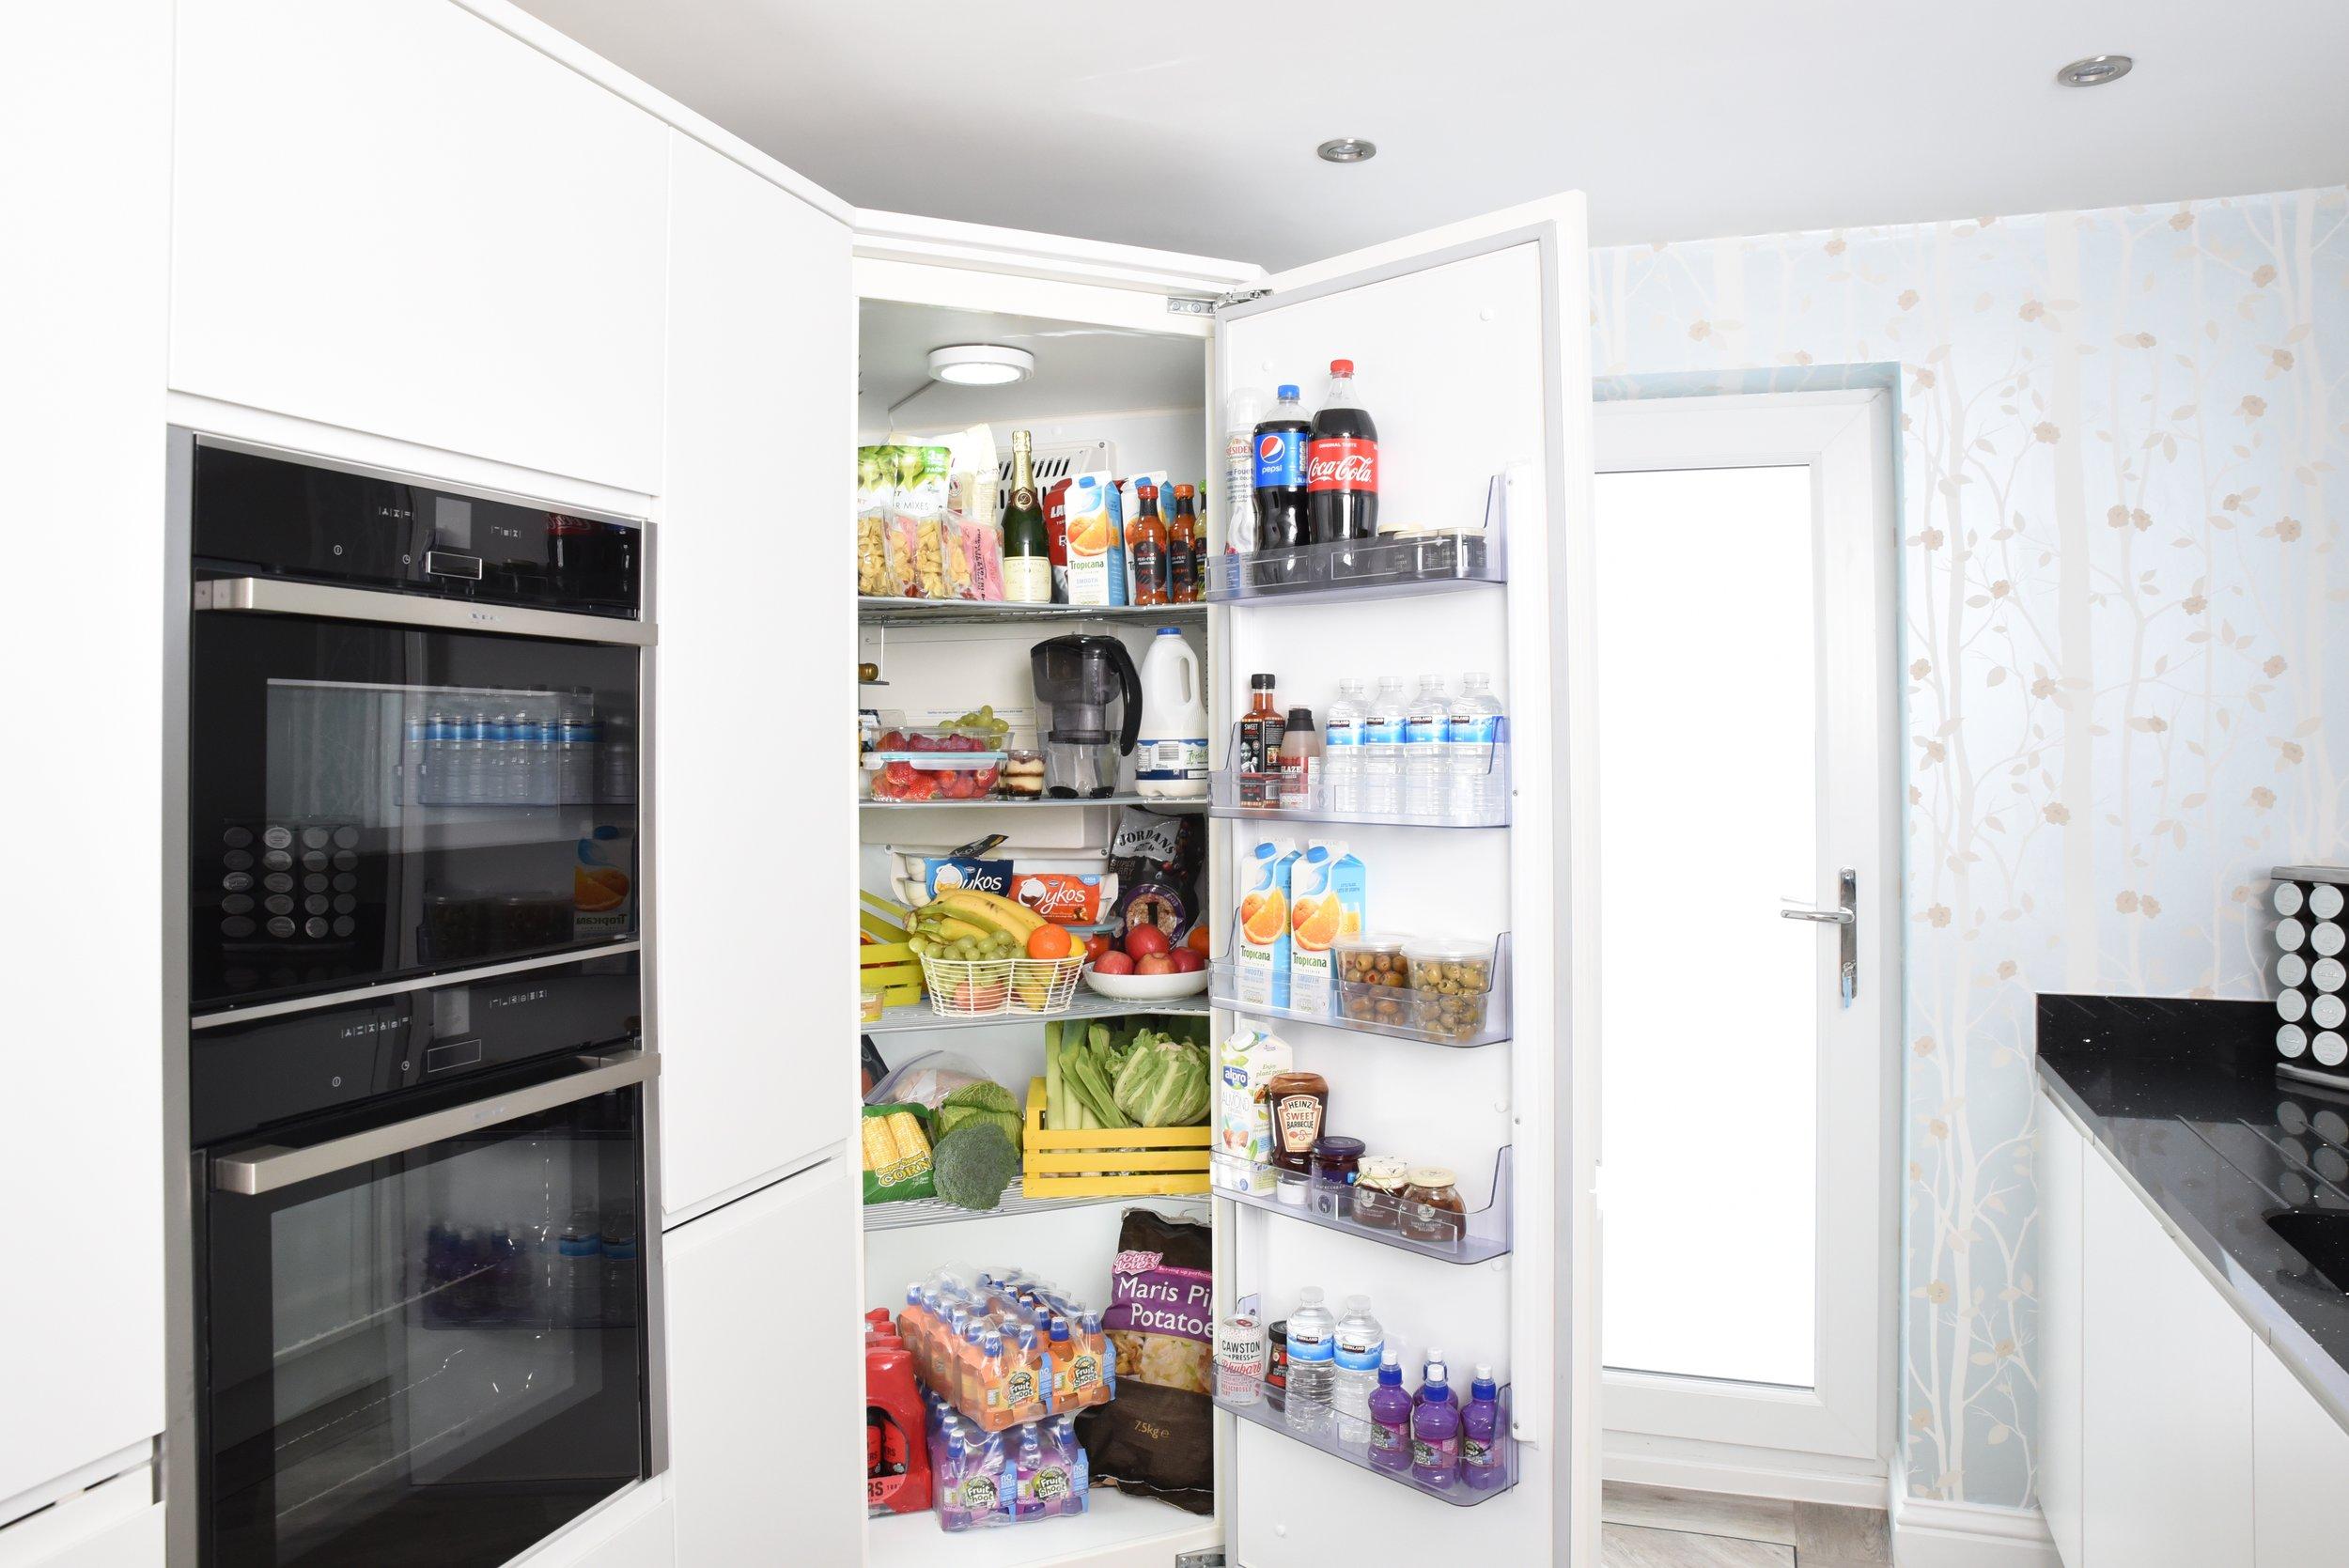 fridge-3475996.jpg